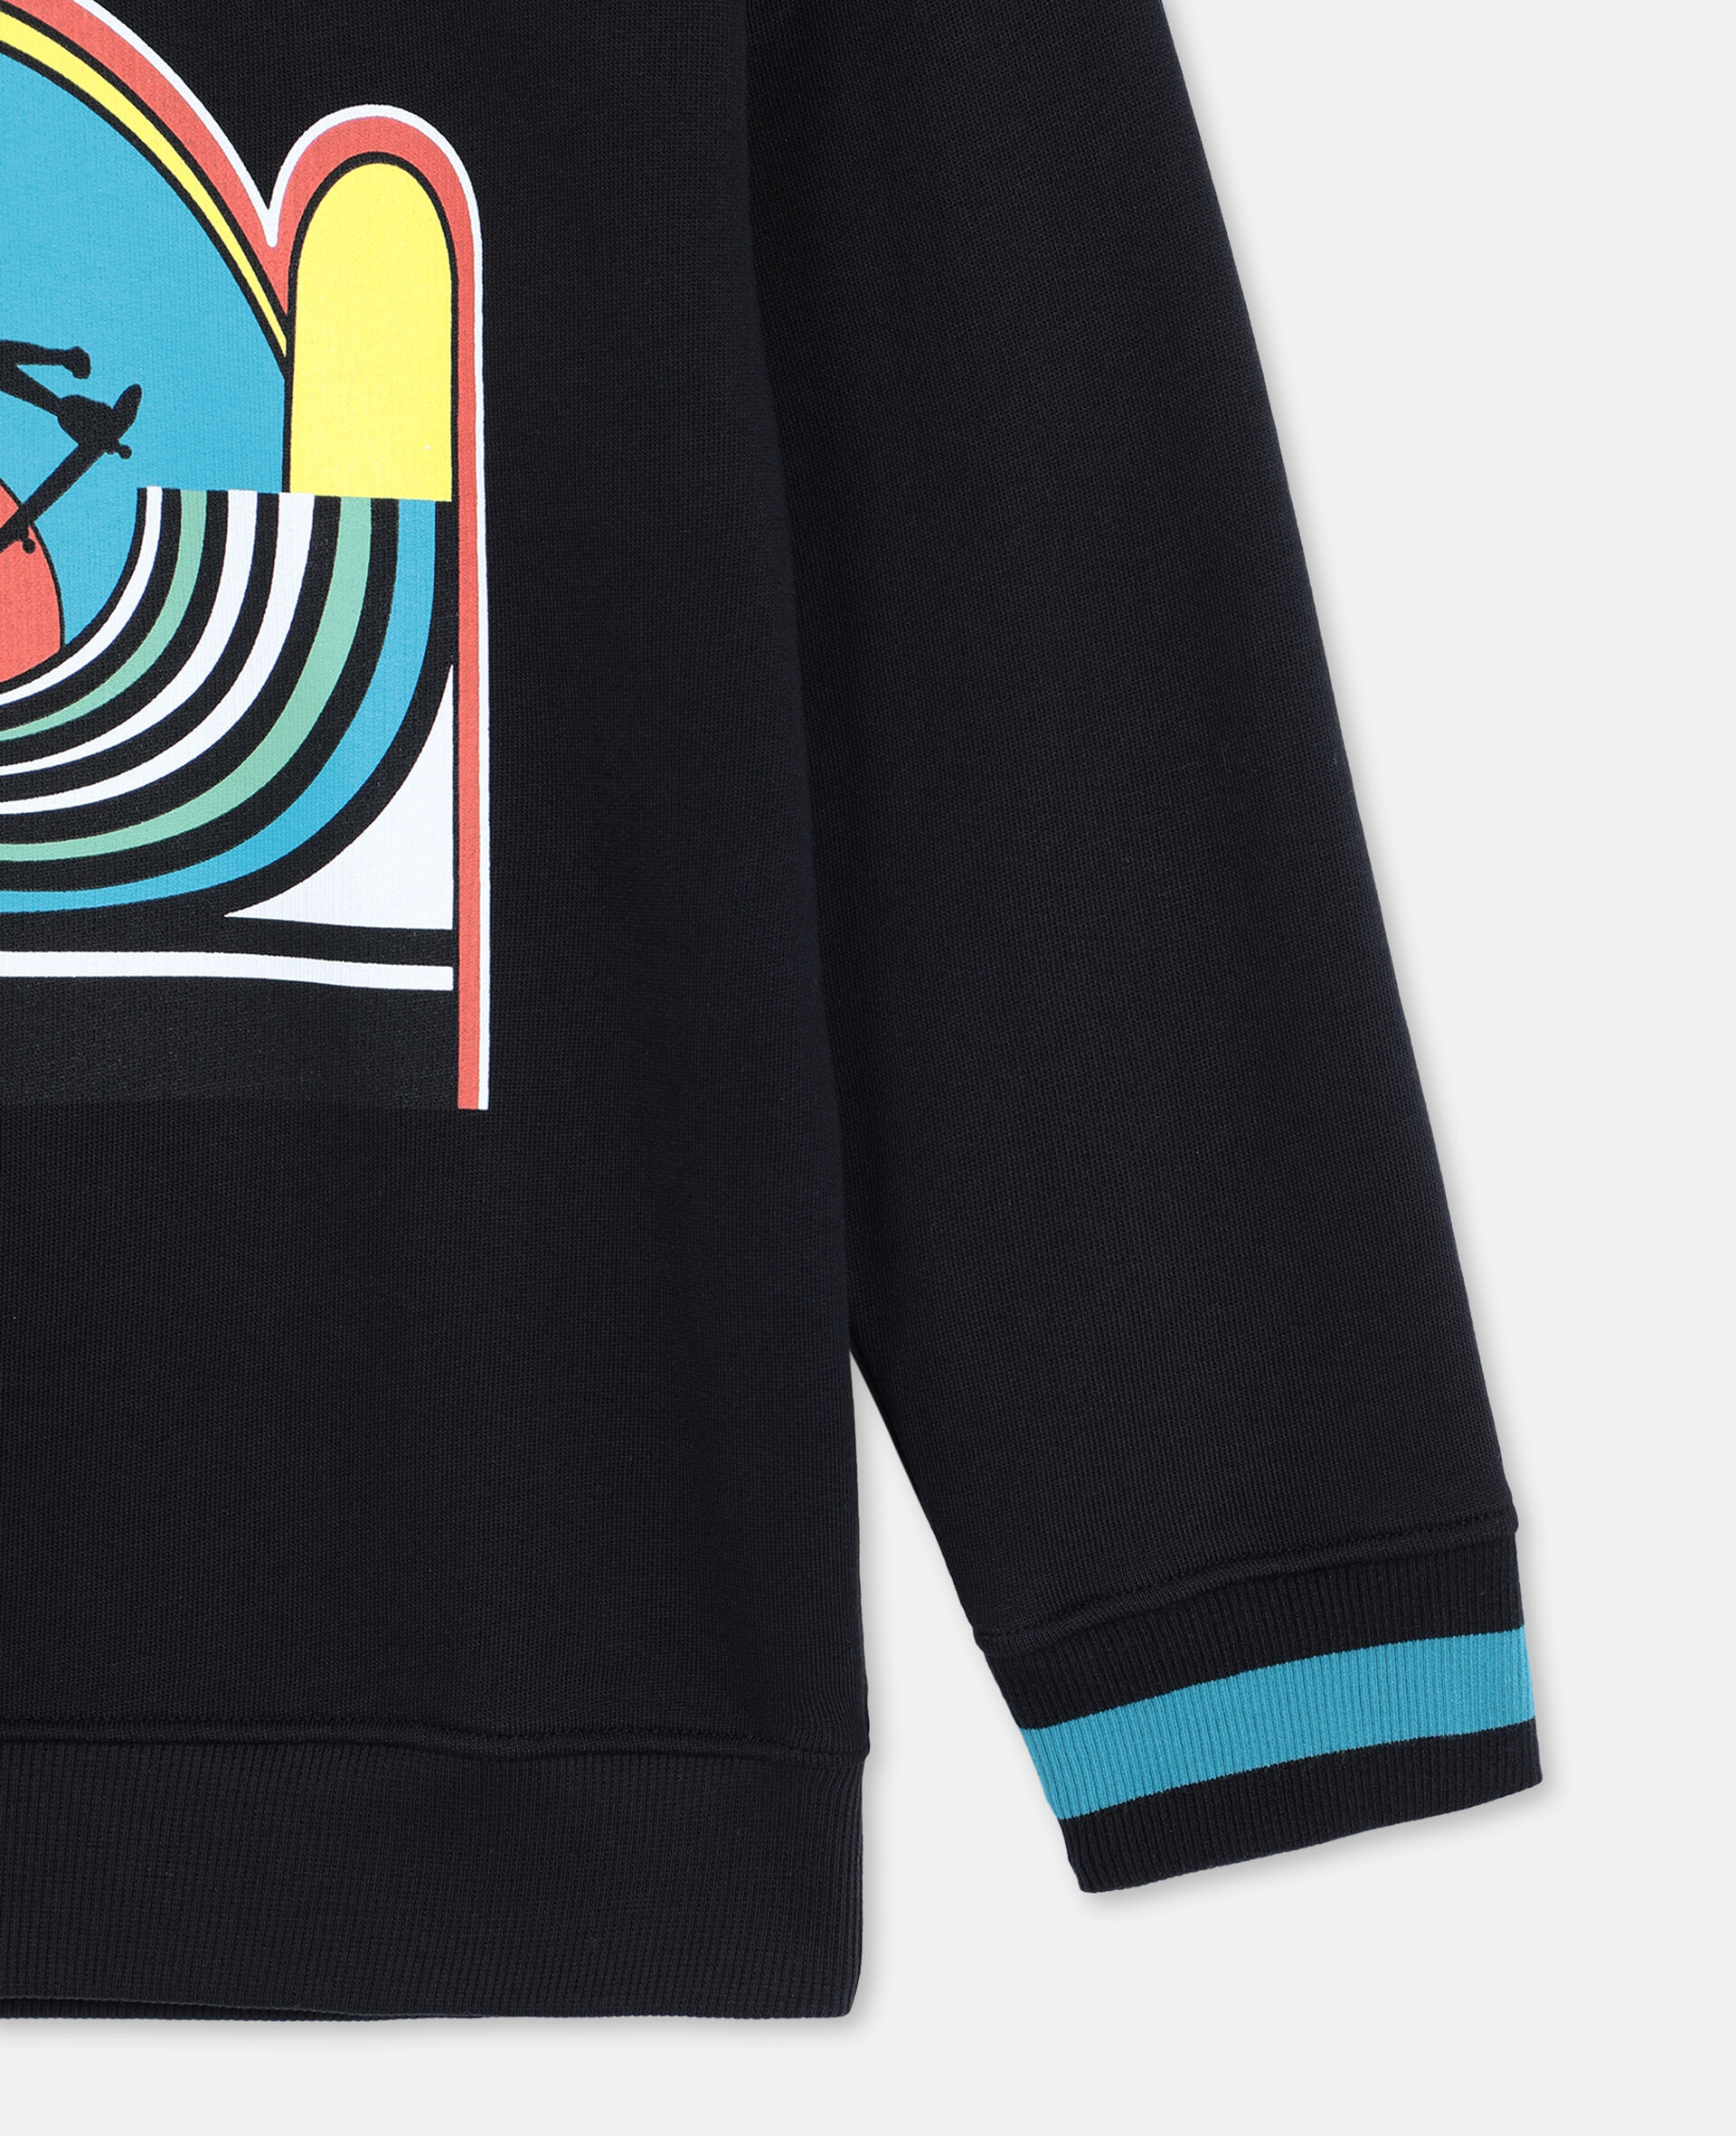 Skater Oversize Cotton Sweatshirt -Black-large image number 2